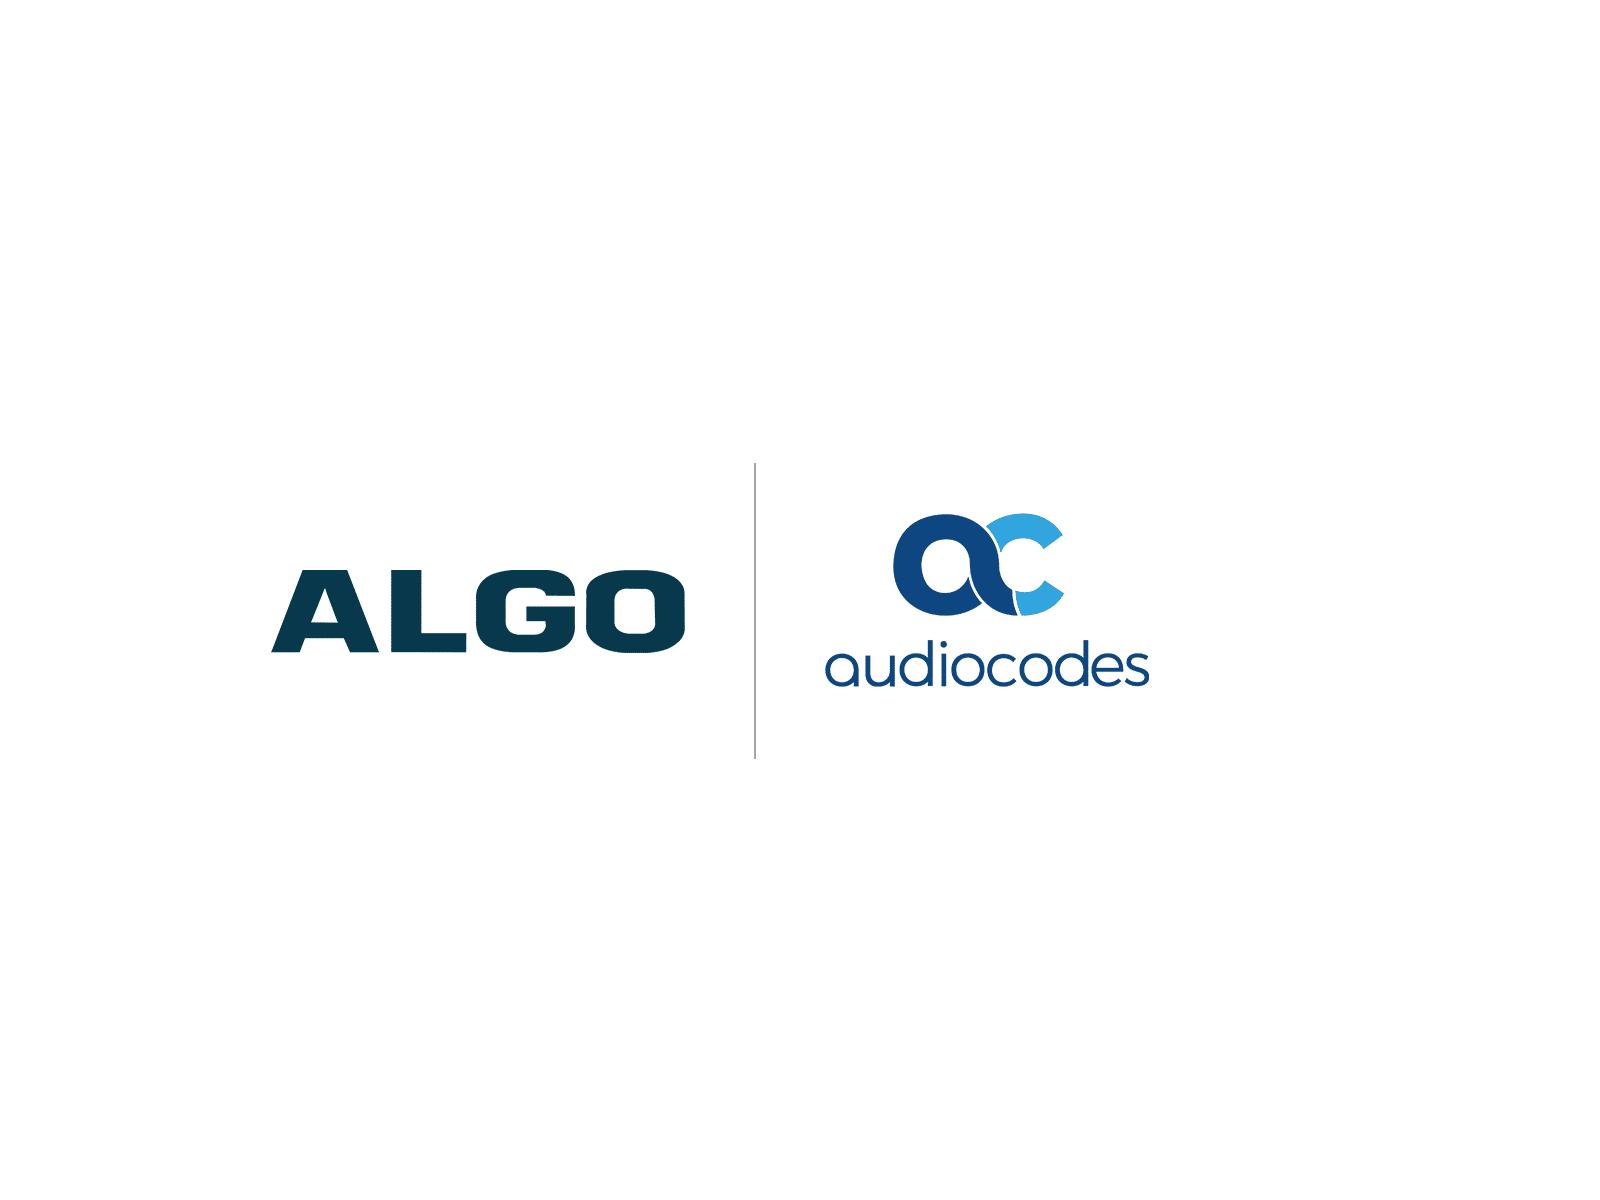 Algo Audiocodes Compatibility